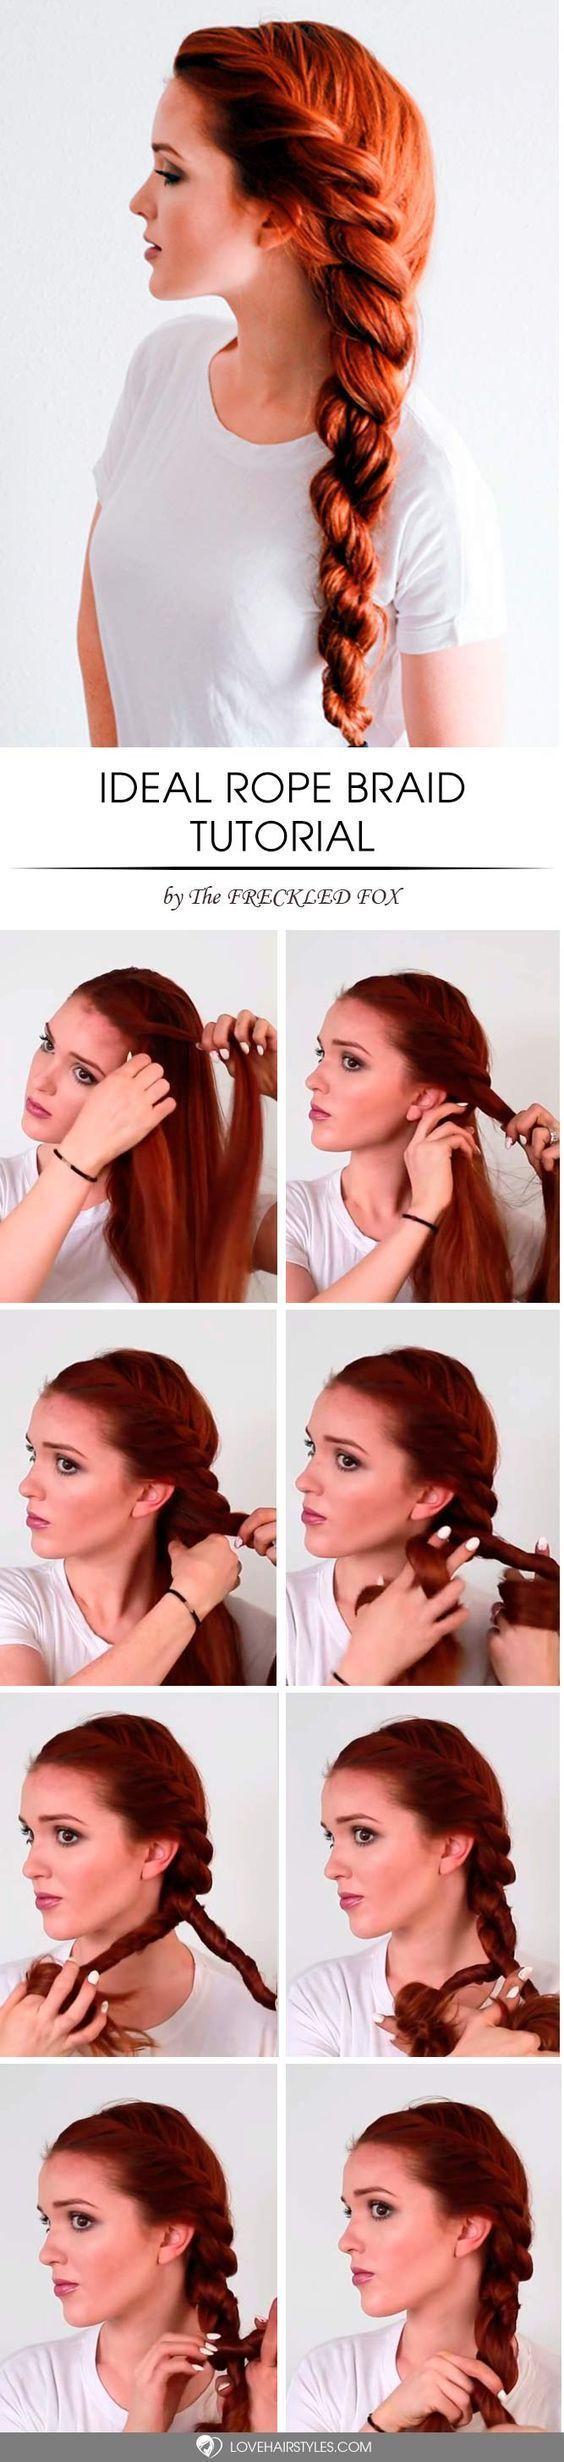 """Truly Impressive Rope Braid Hairstyle"""